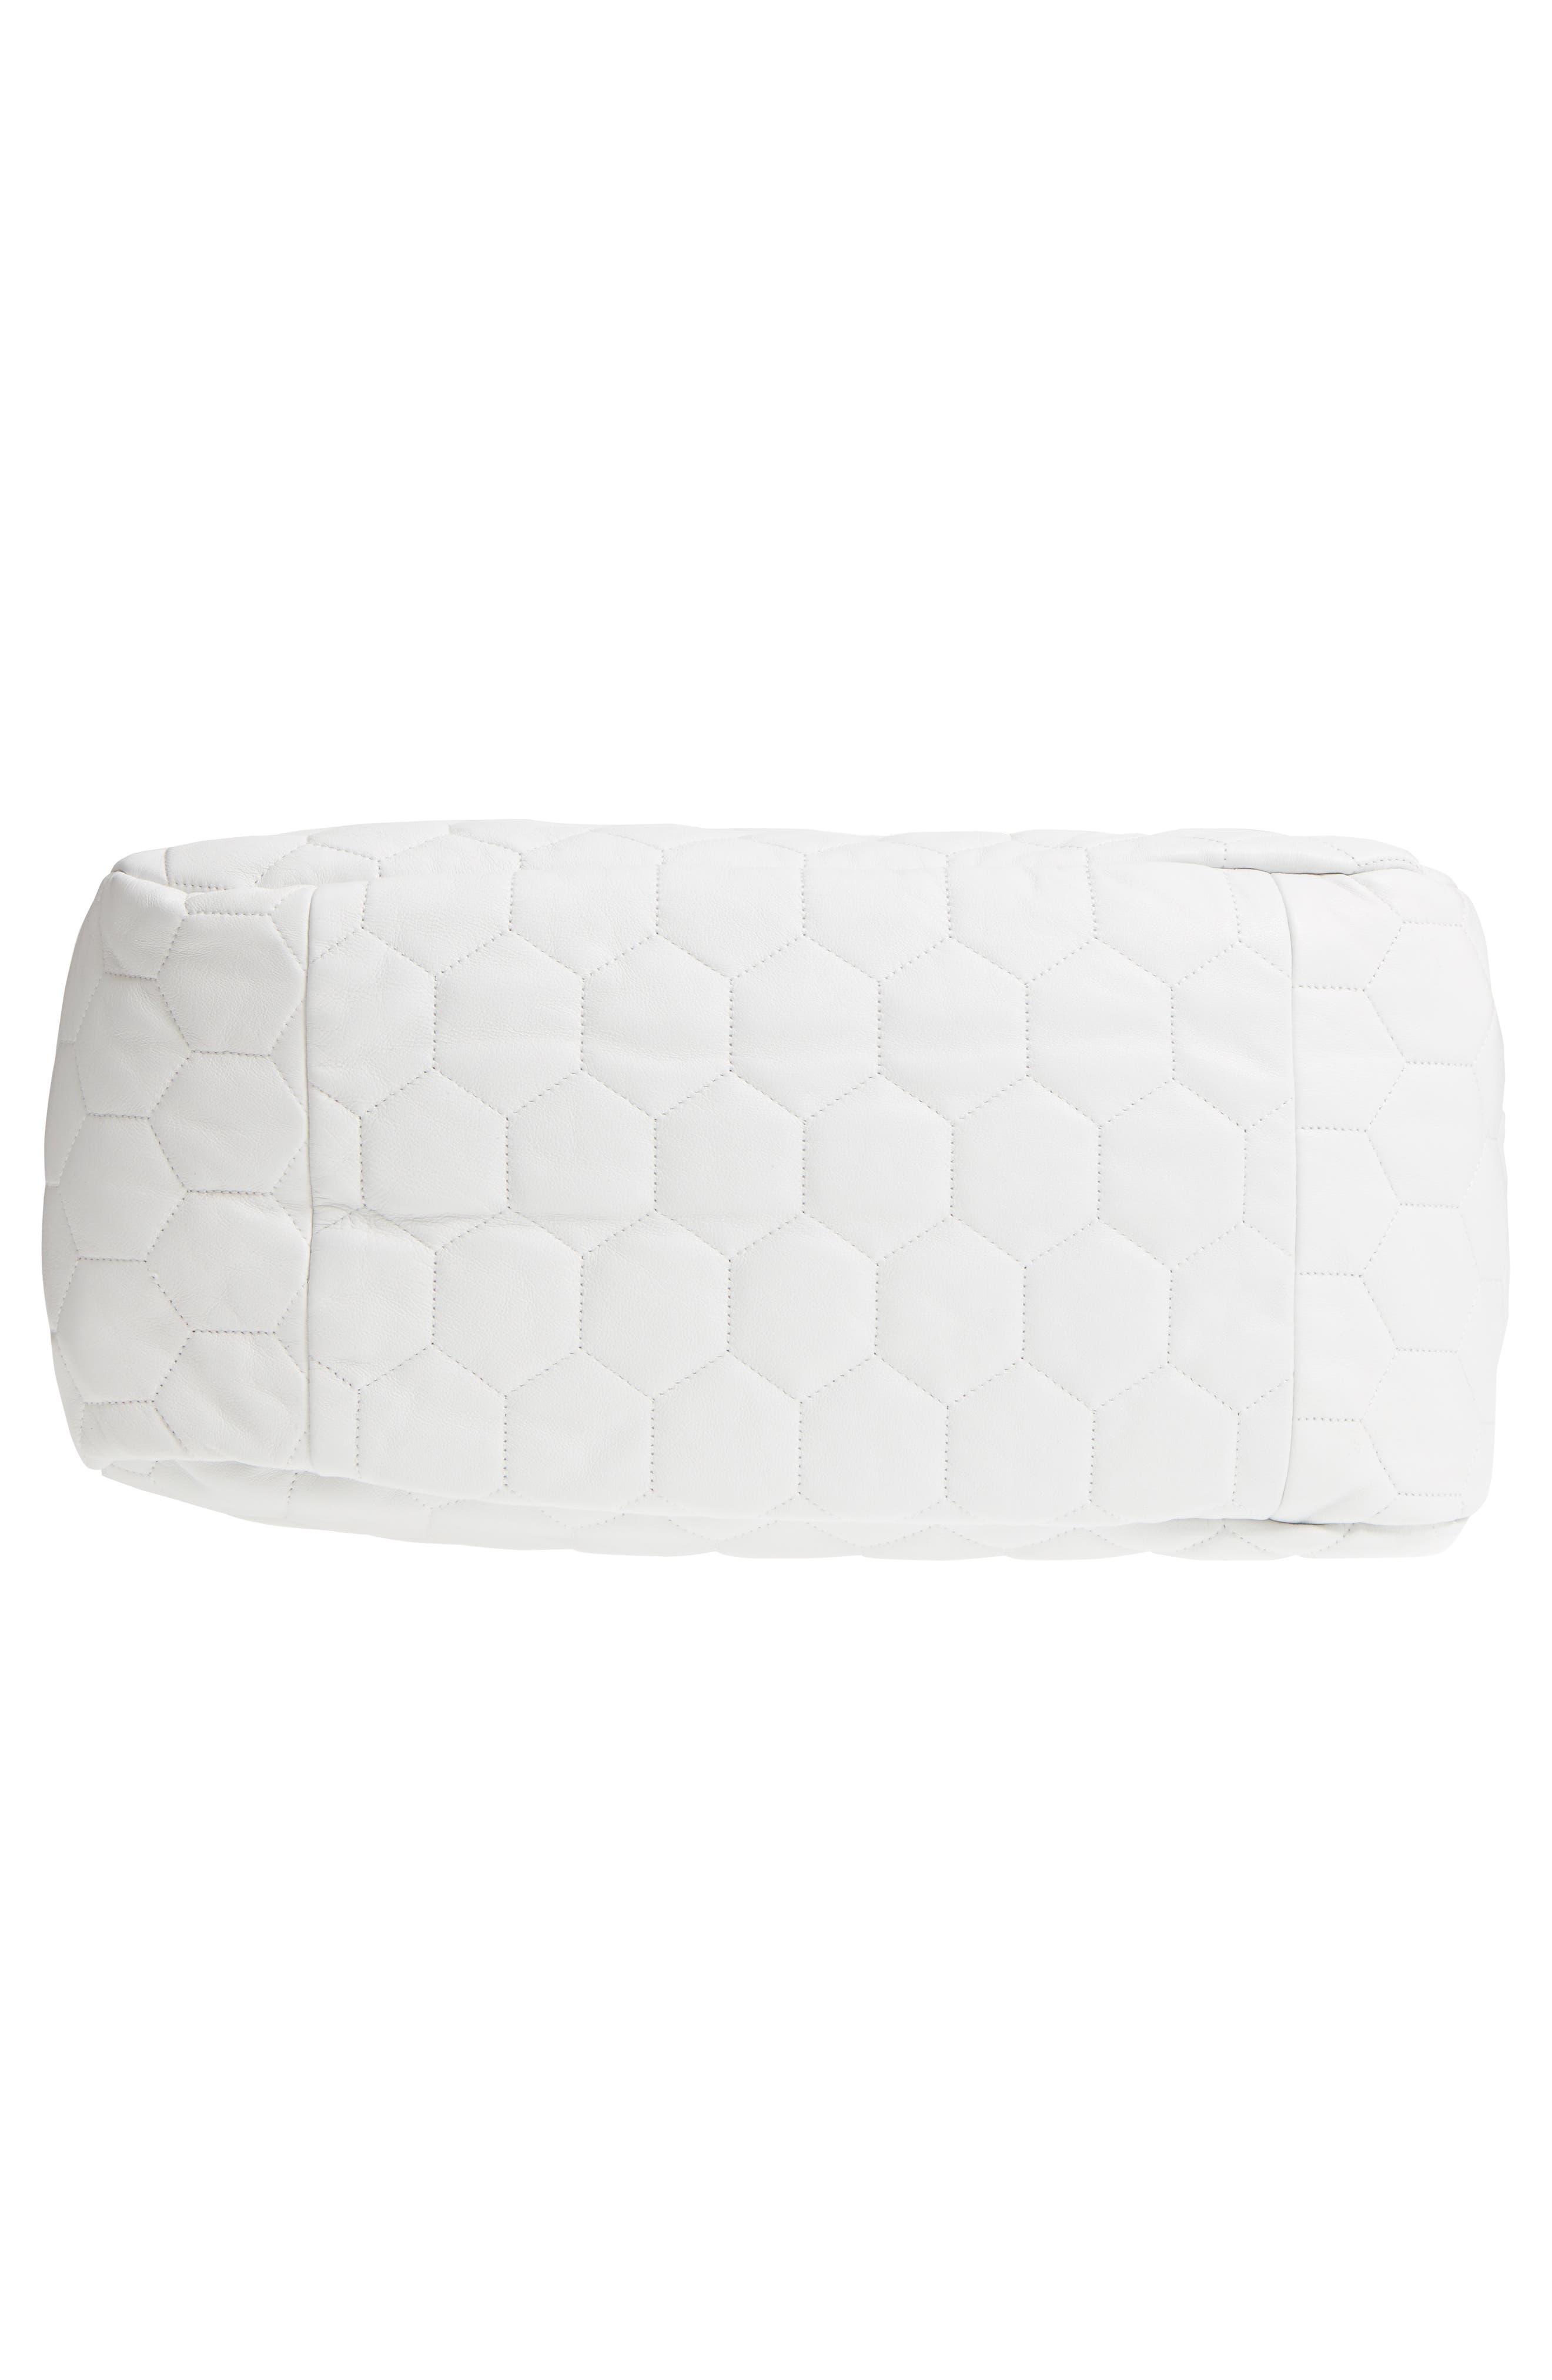 Balloon Leather Shoulder Bag,                             Alternate thumbnail 6, color,                             White